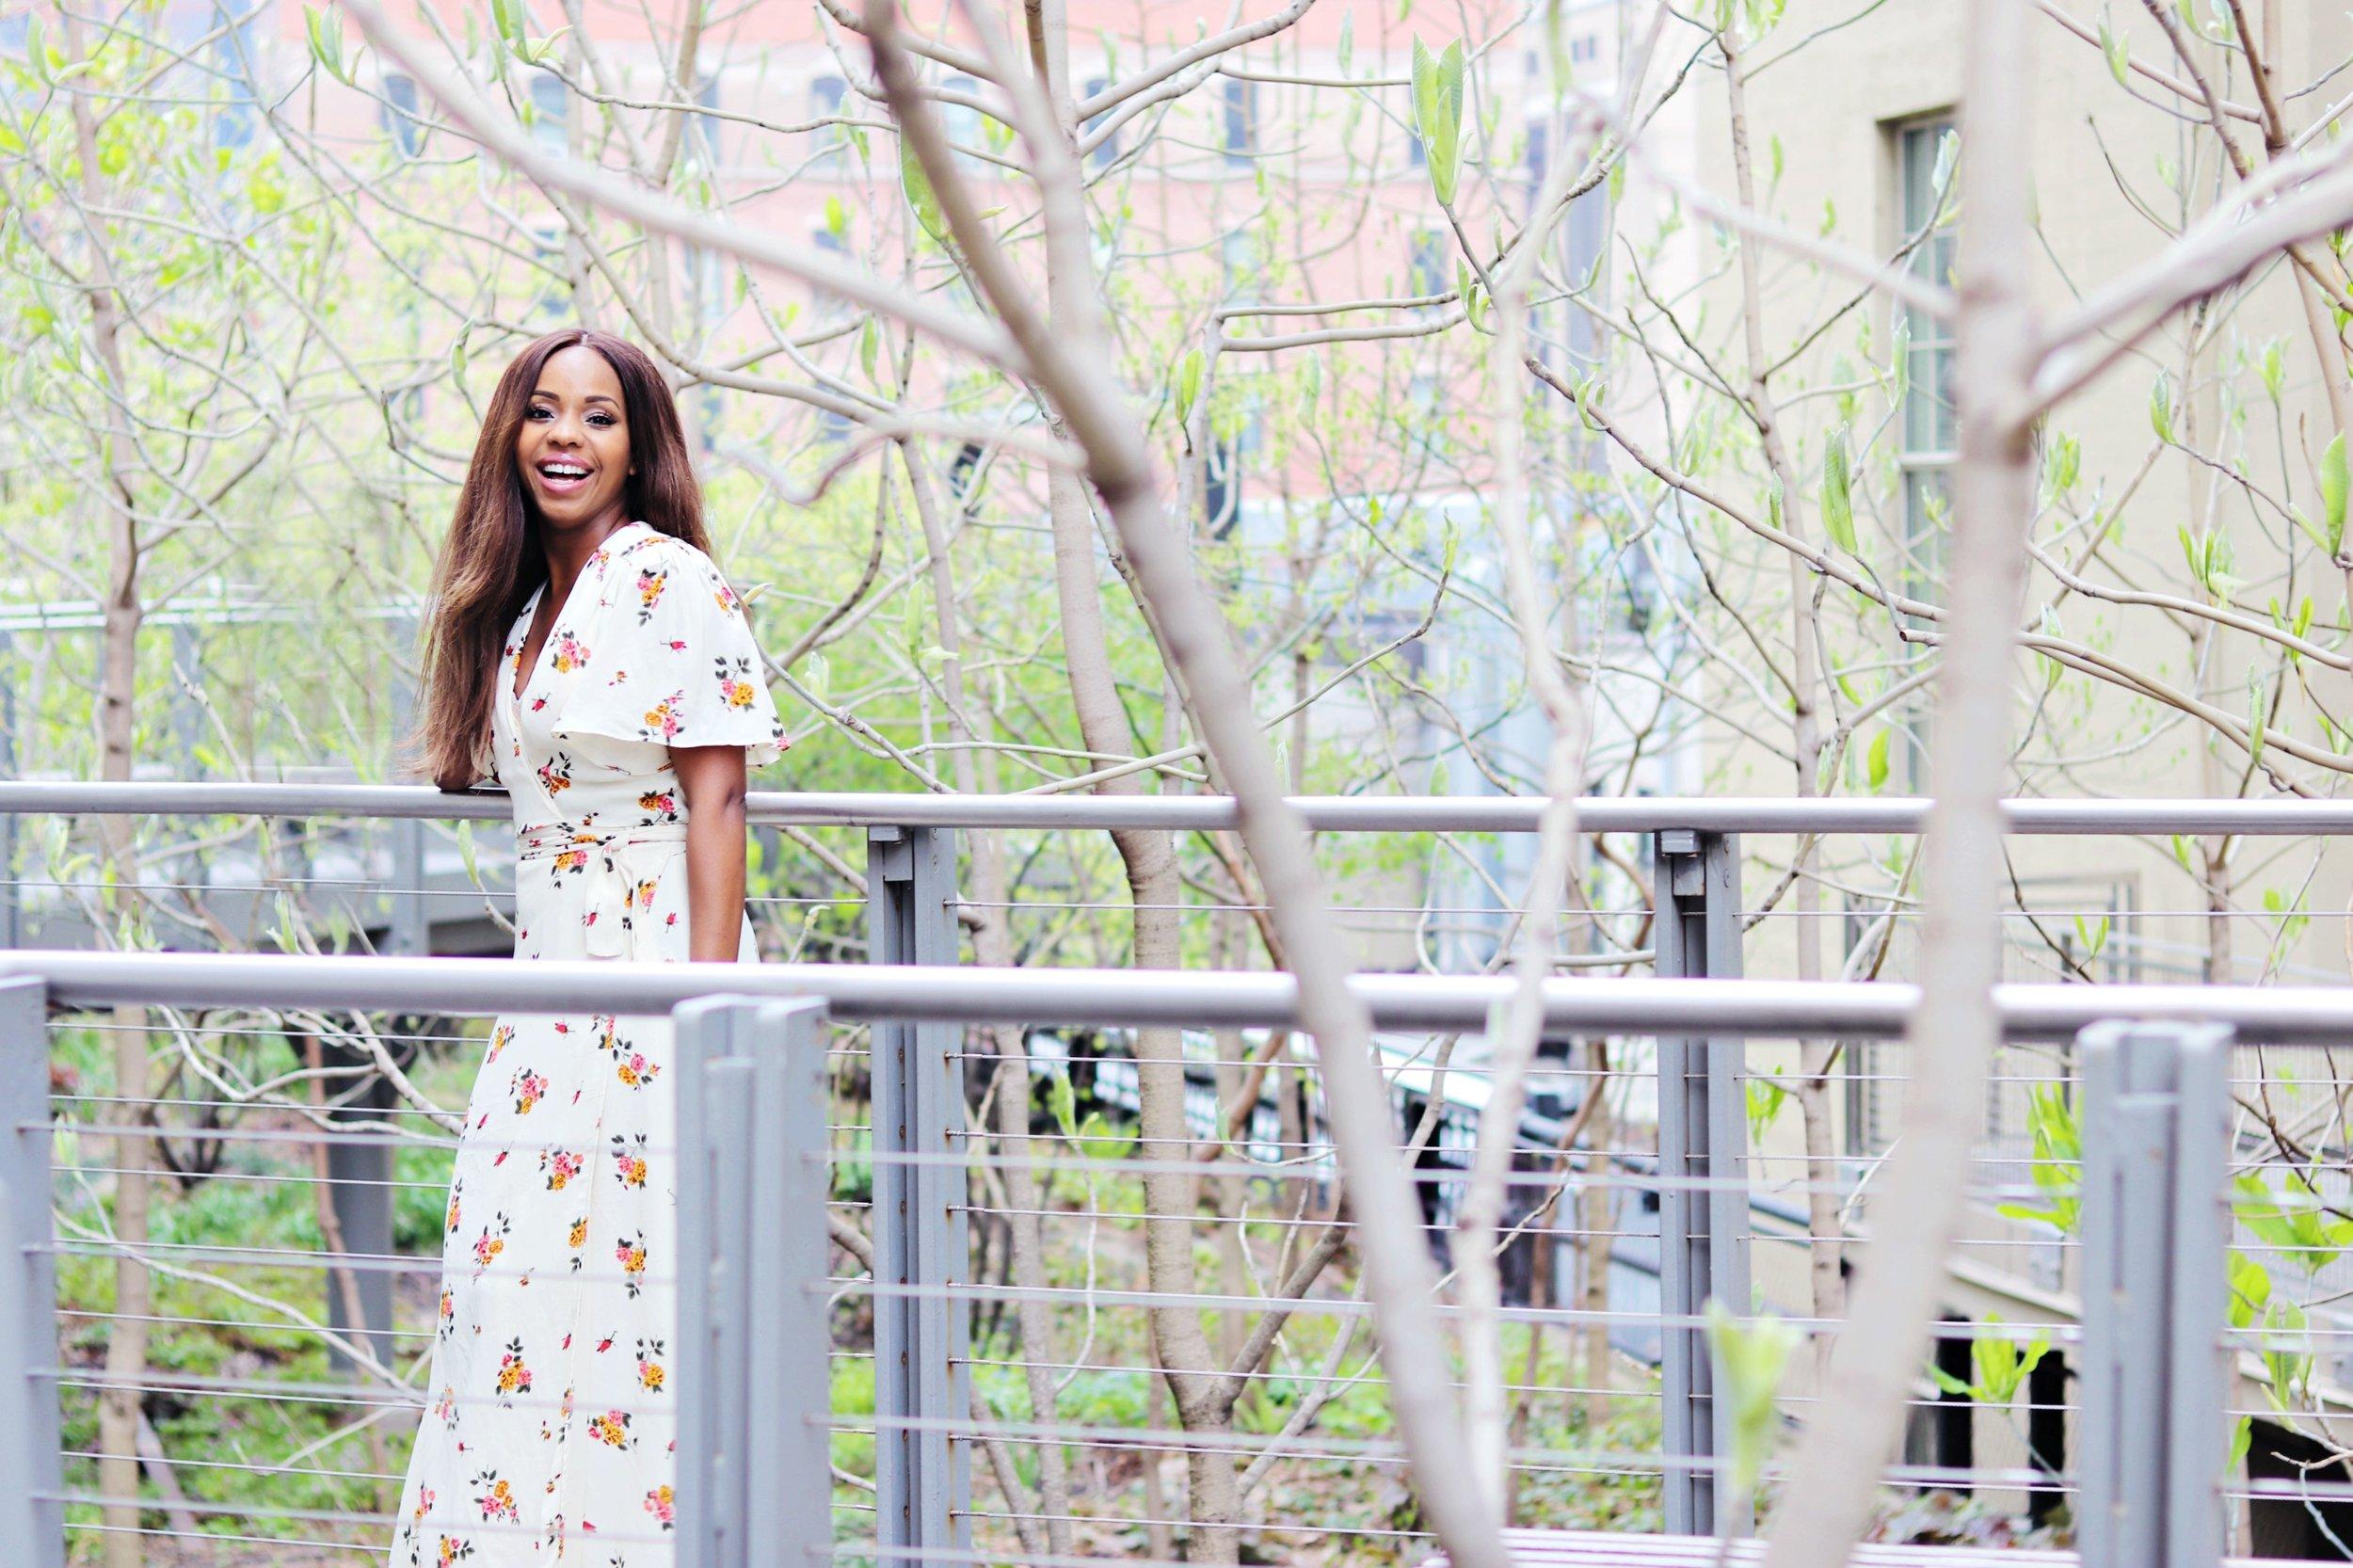 highline nyc portrait